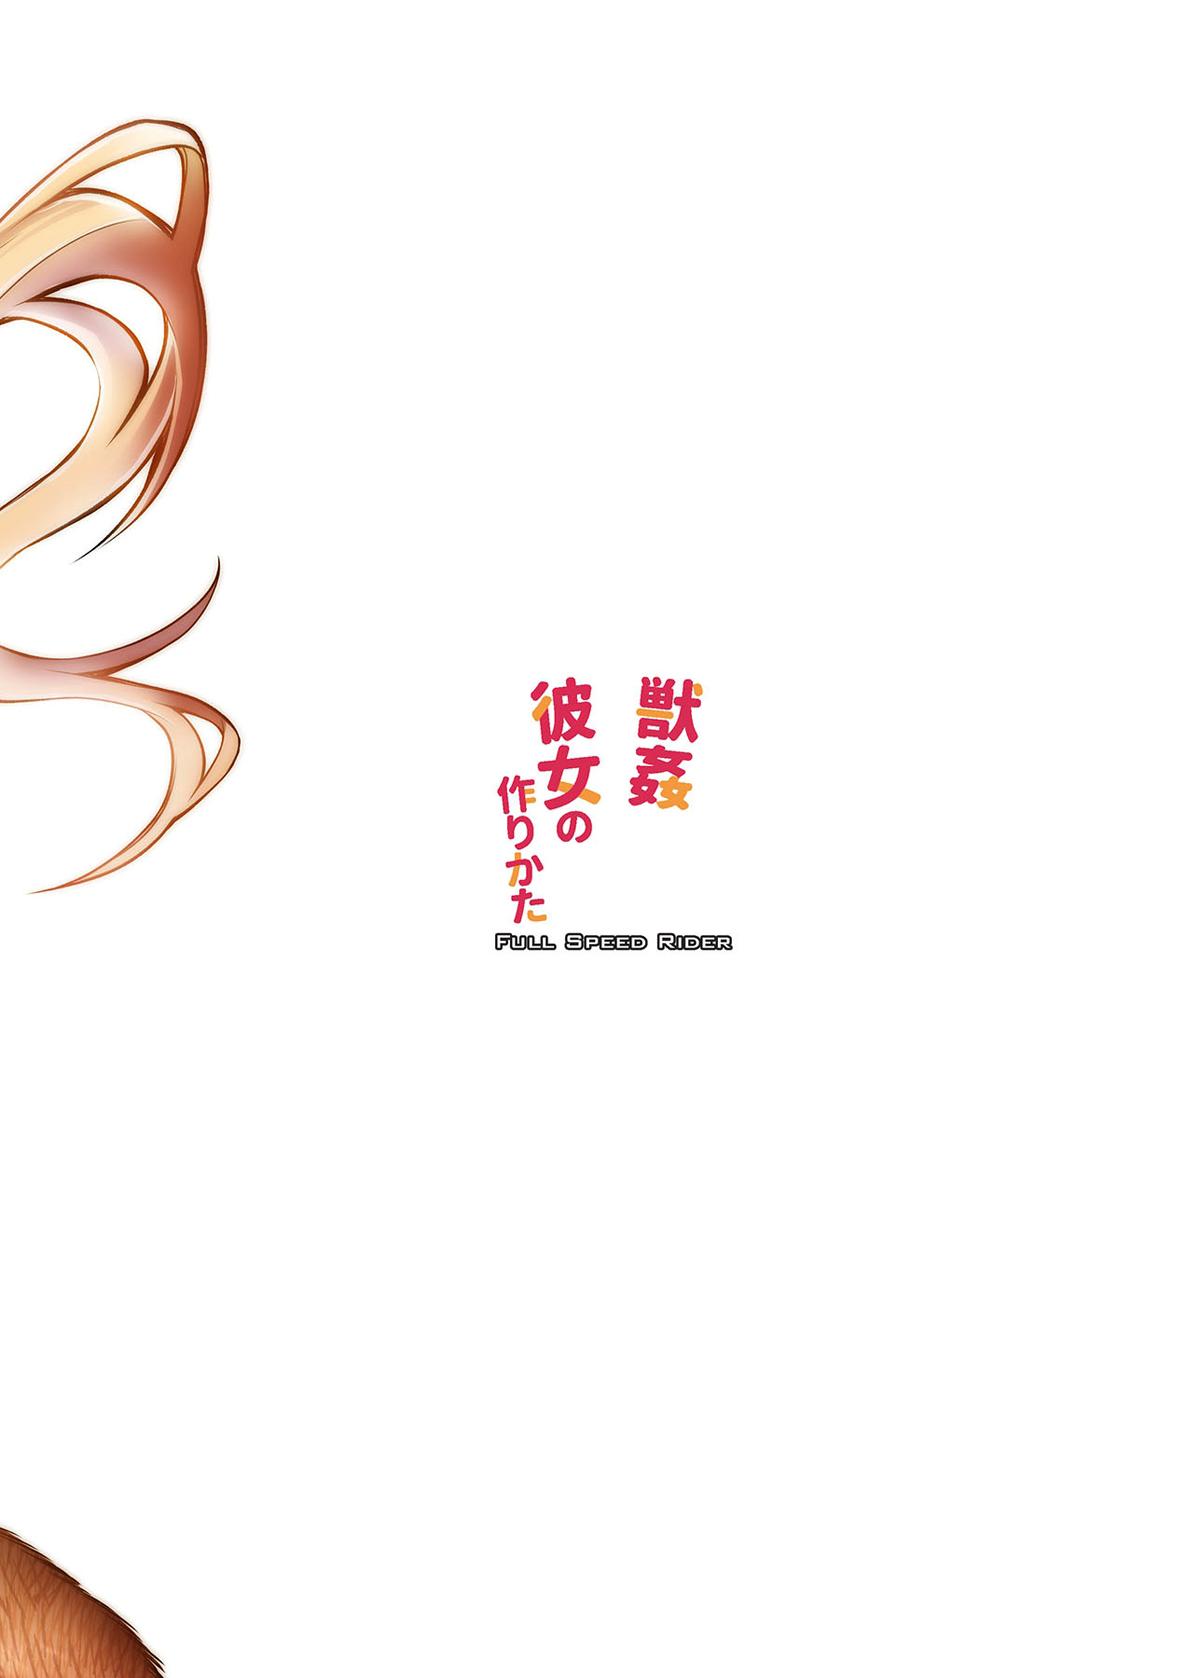 Hình ảnh  trong bài viết Juukan Kanojo no Tsukurikata